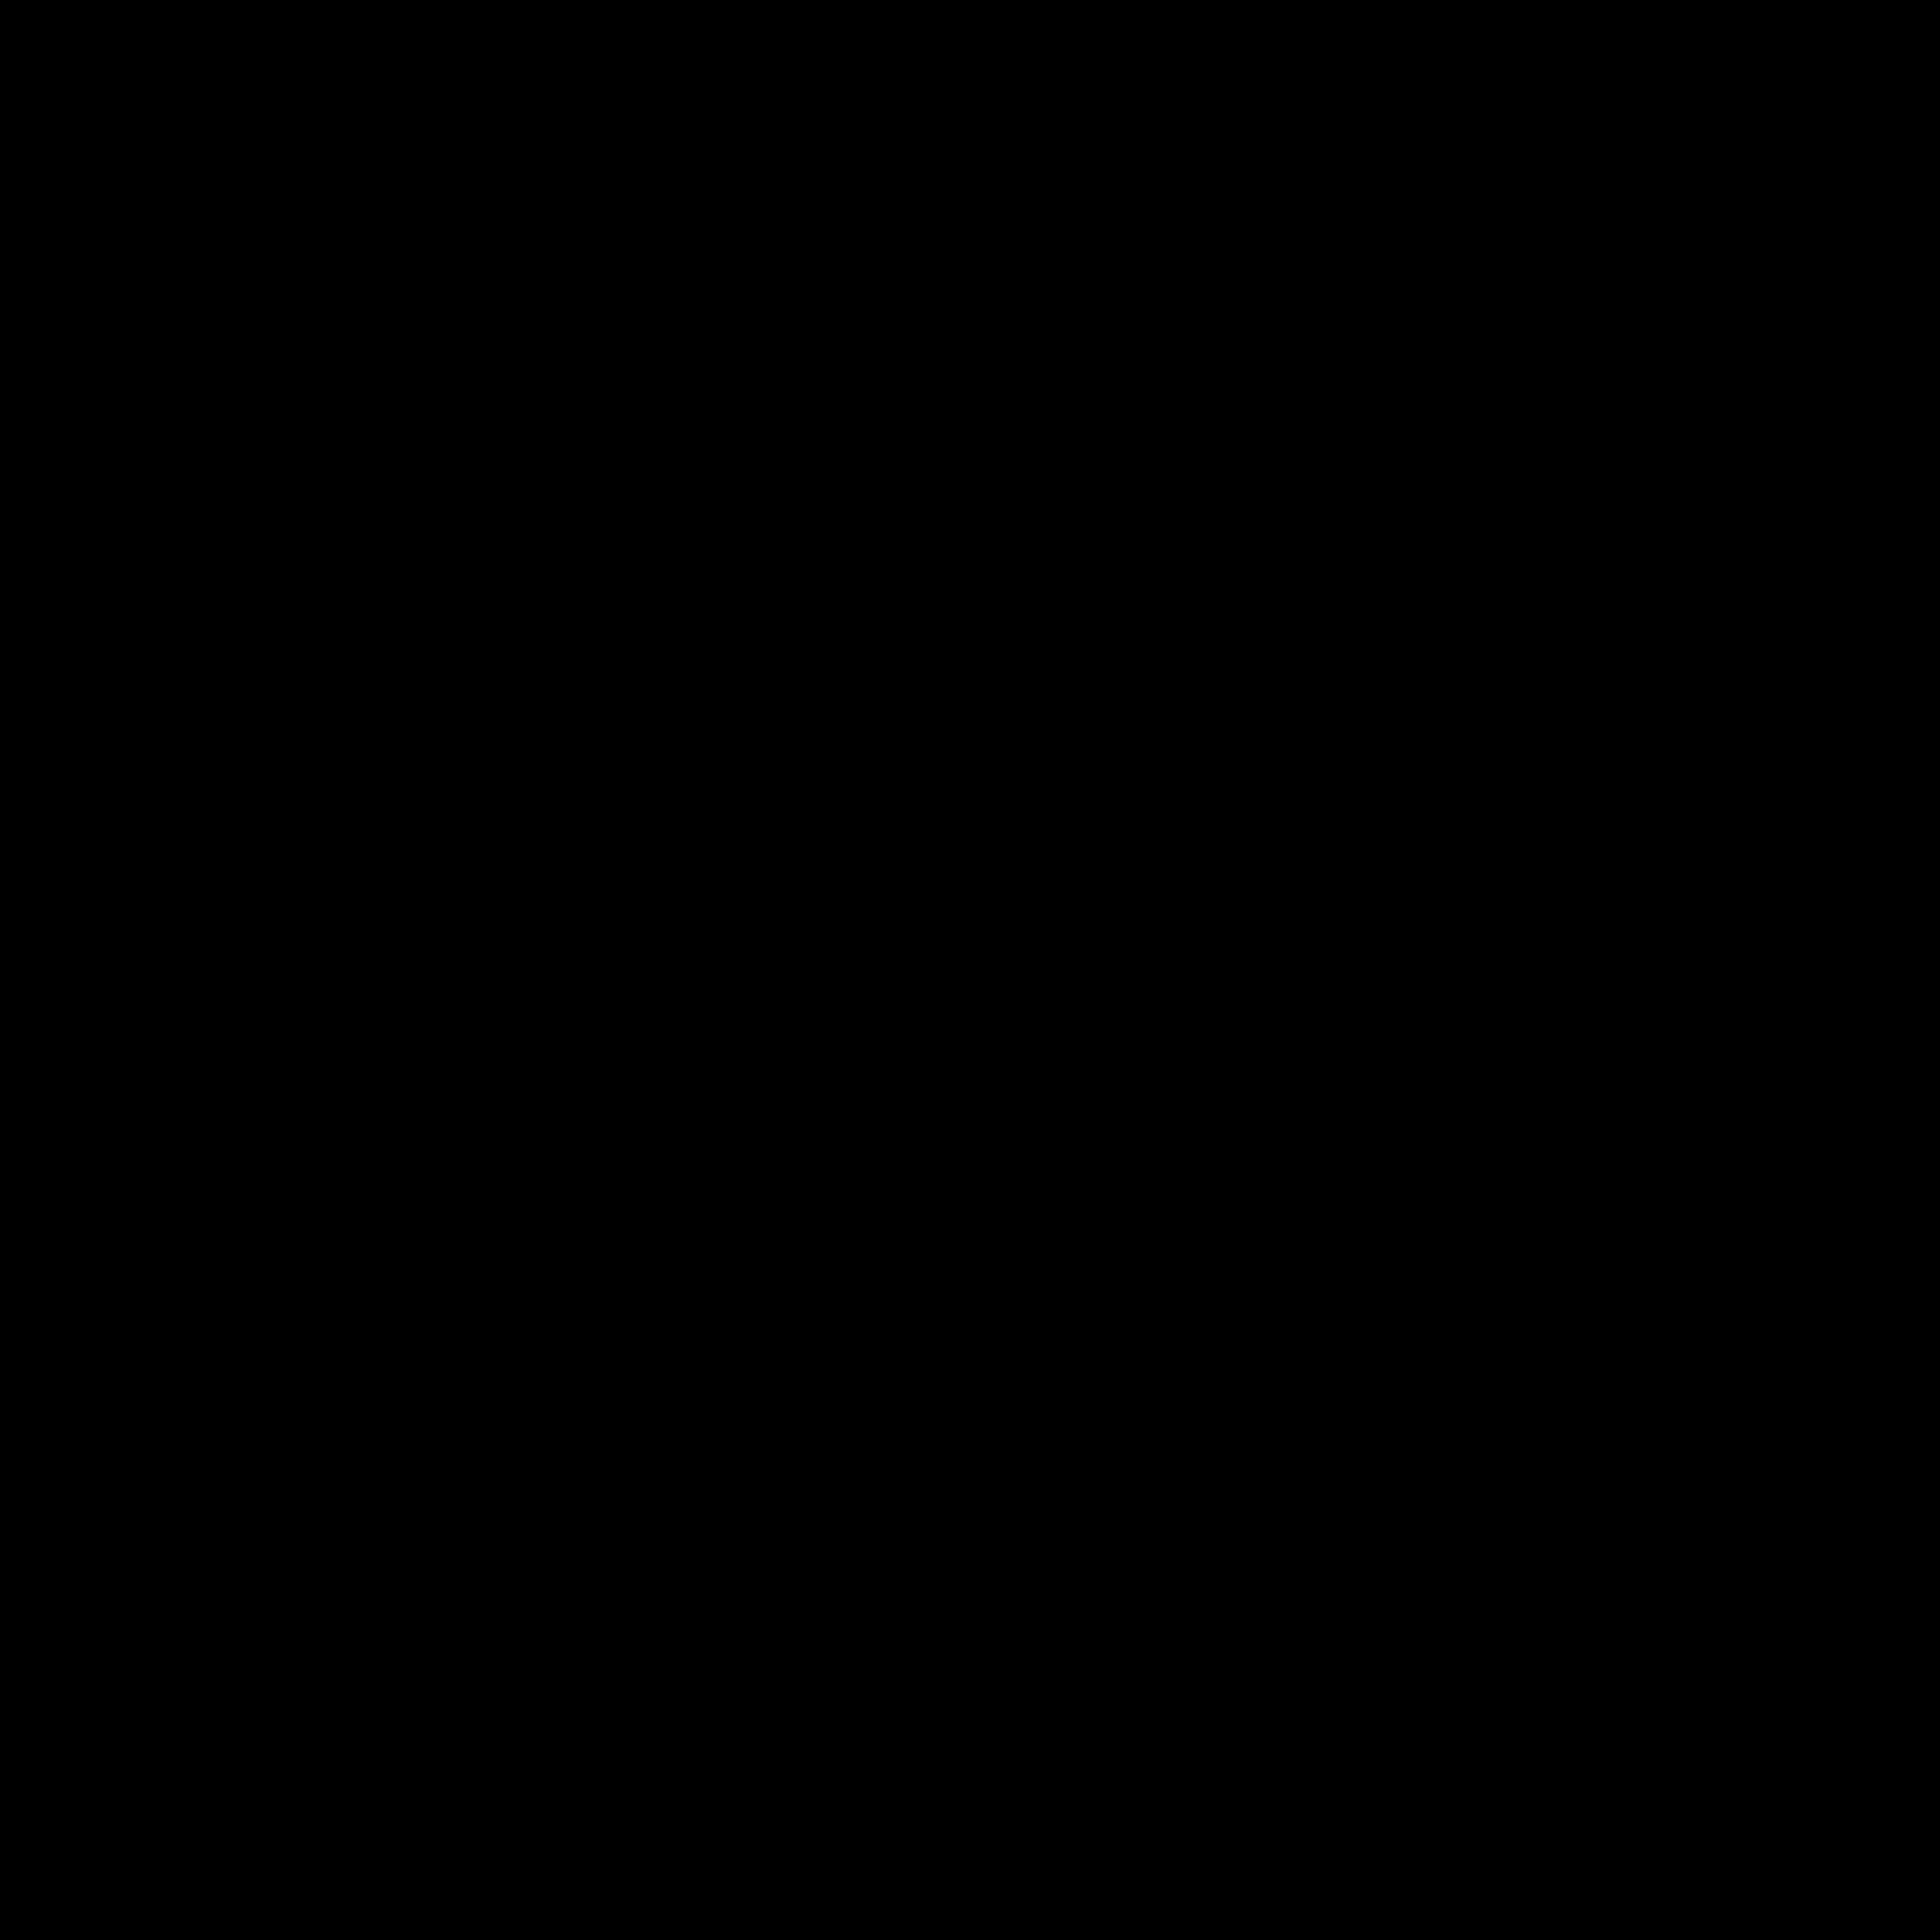 Wired Digital Logo PNG Transparent & SVG Vector - Freebie Supply